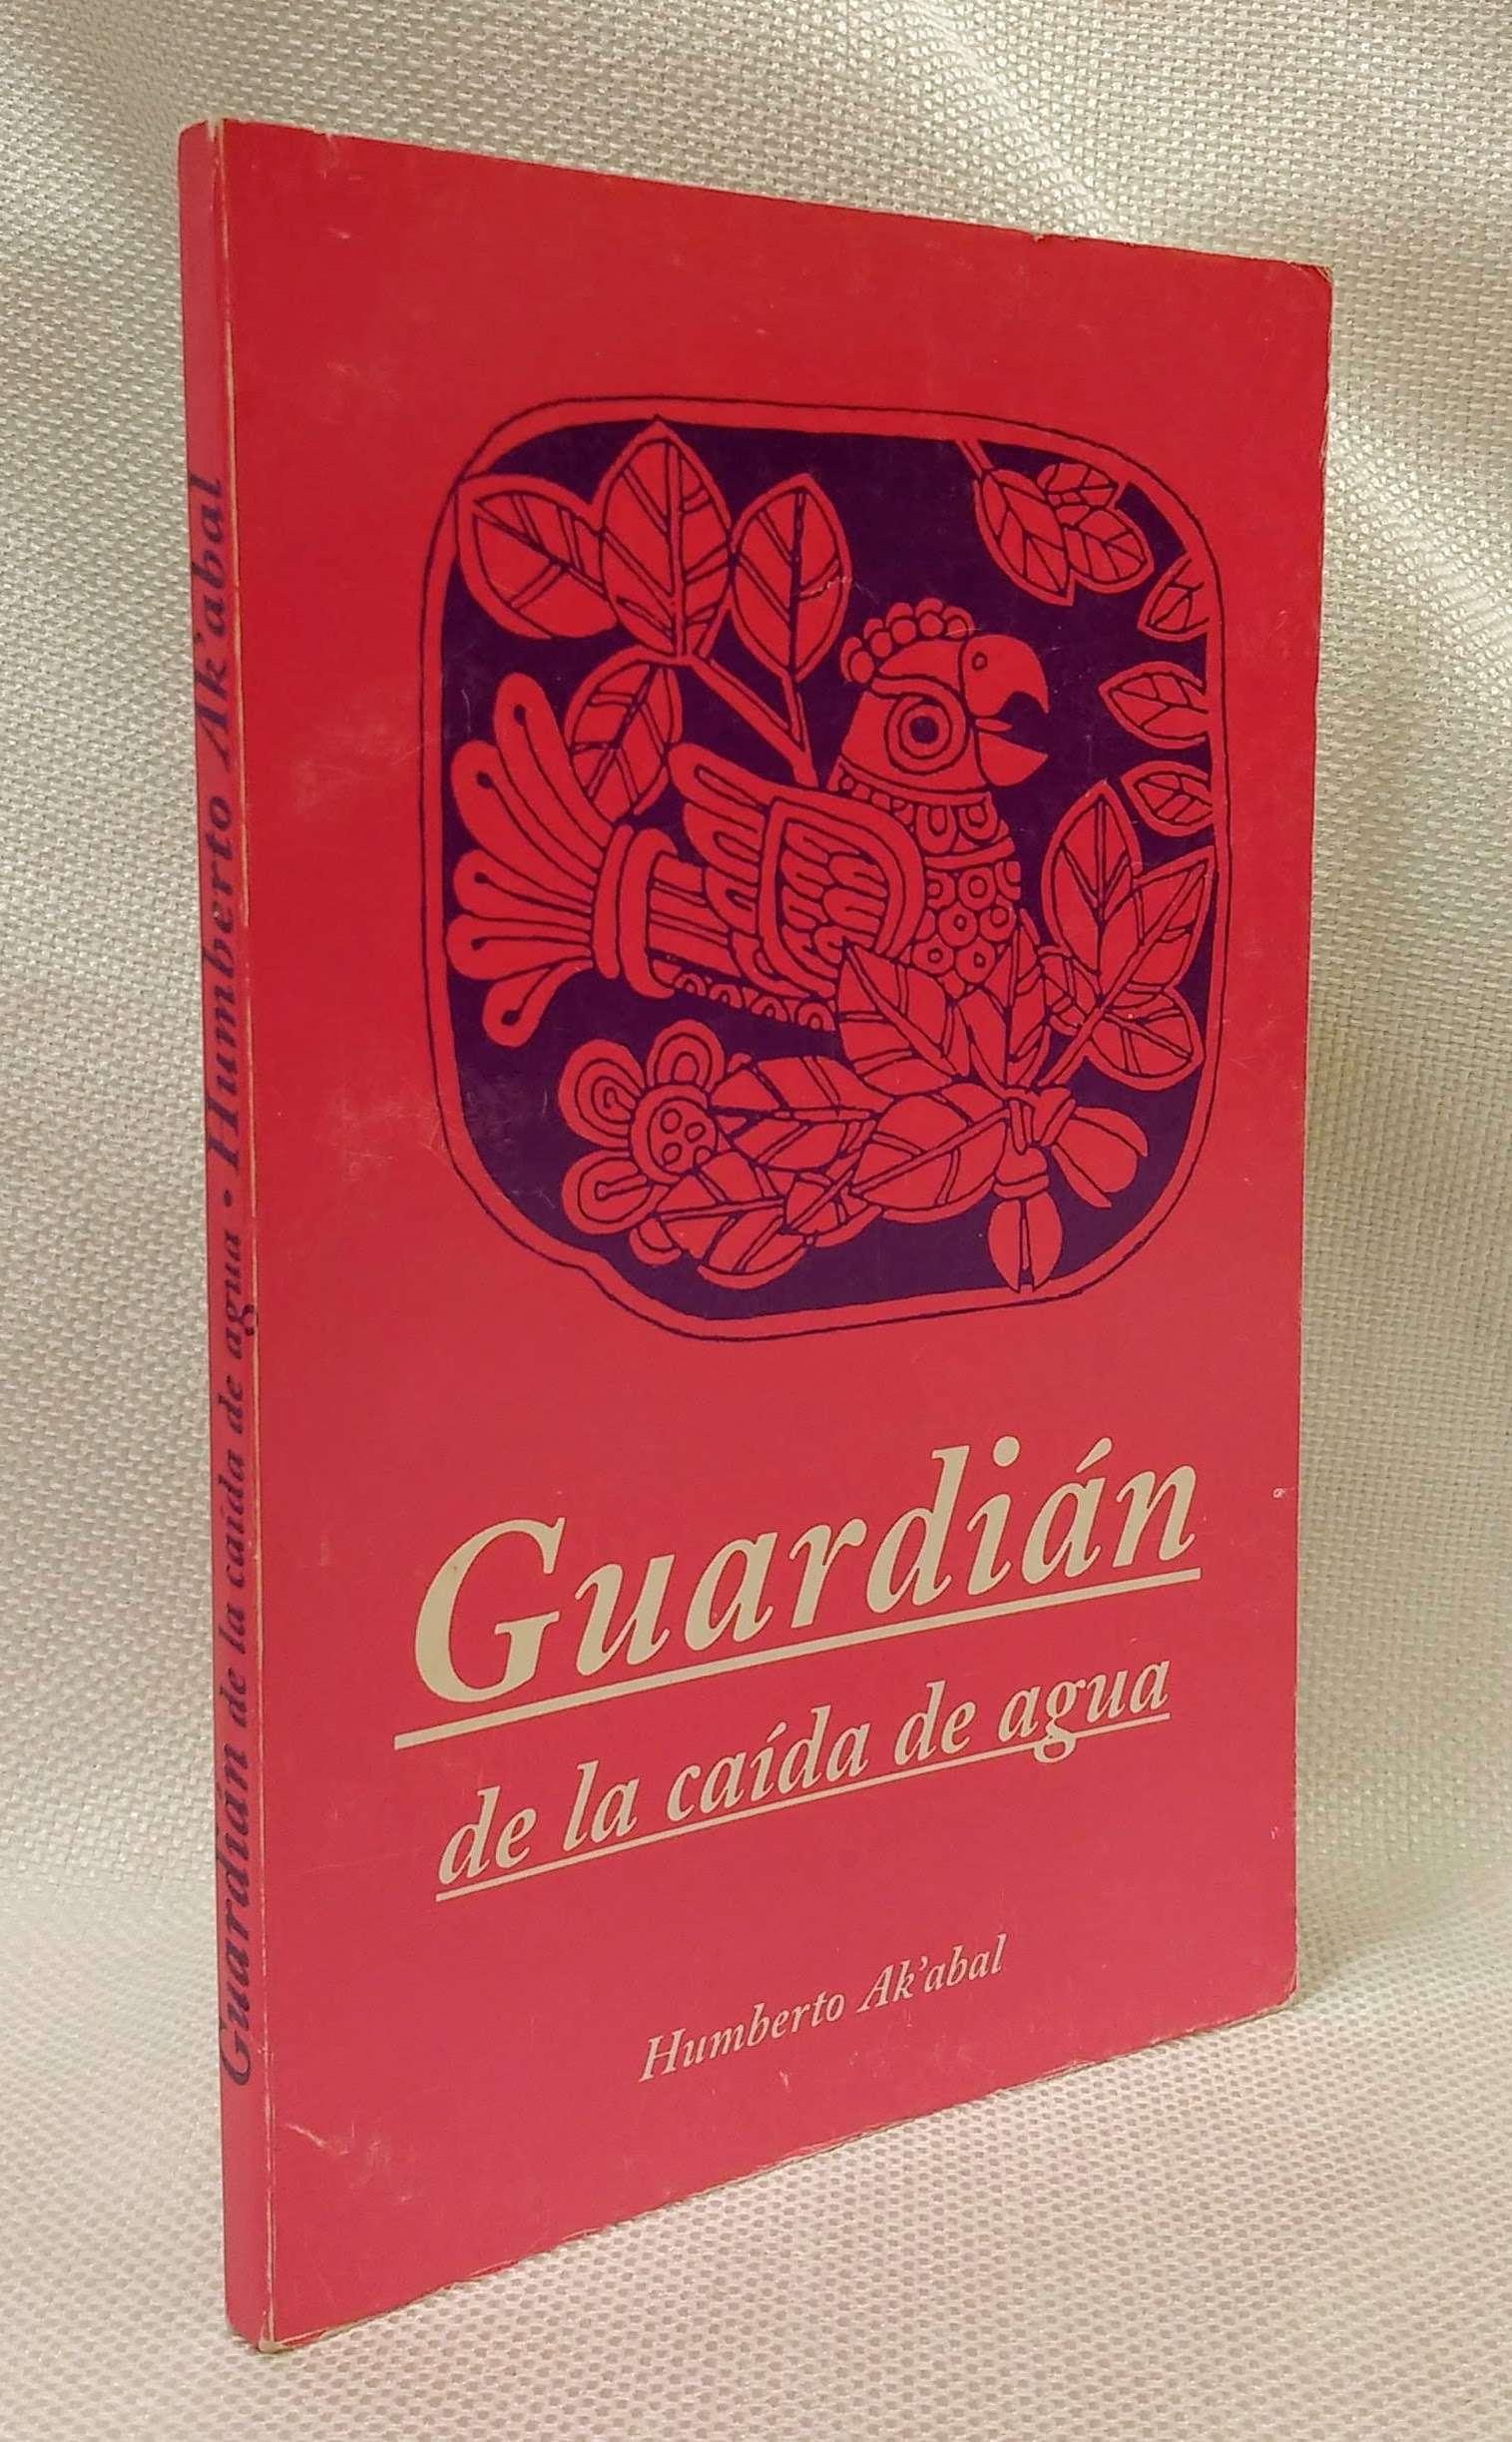 Guardian de la caida de agua, Ak'abal, Humberto